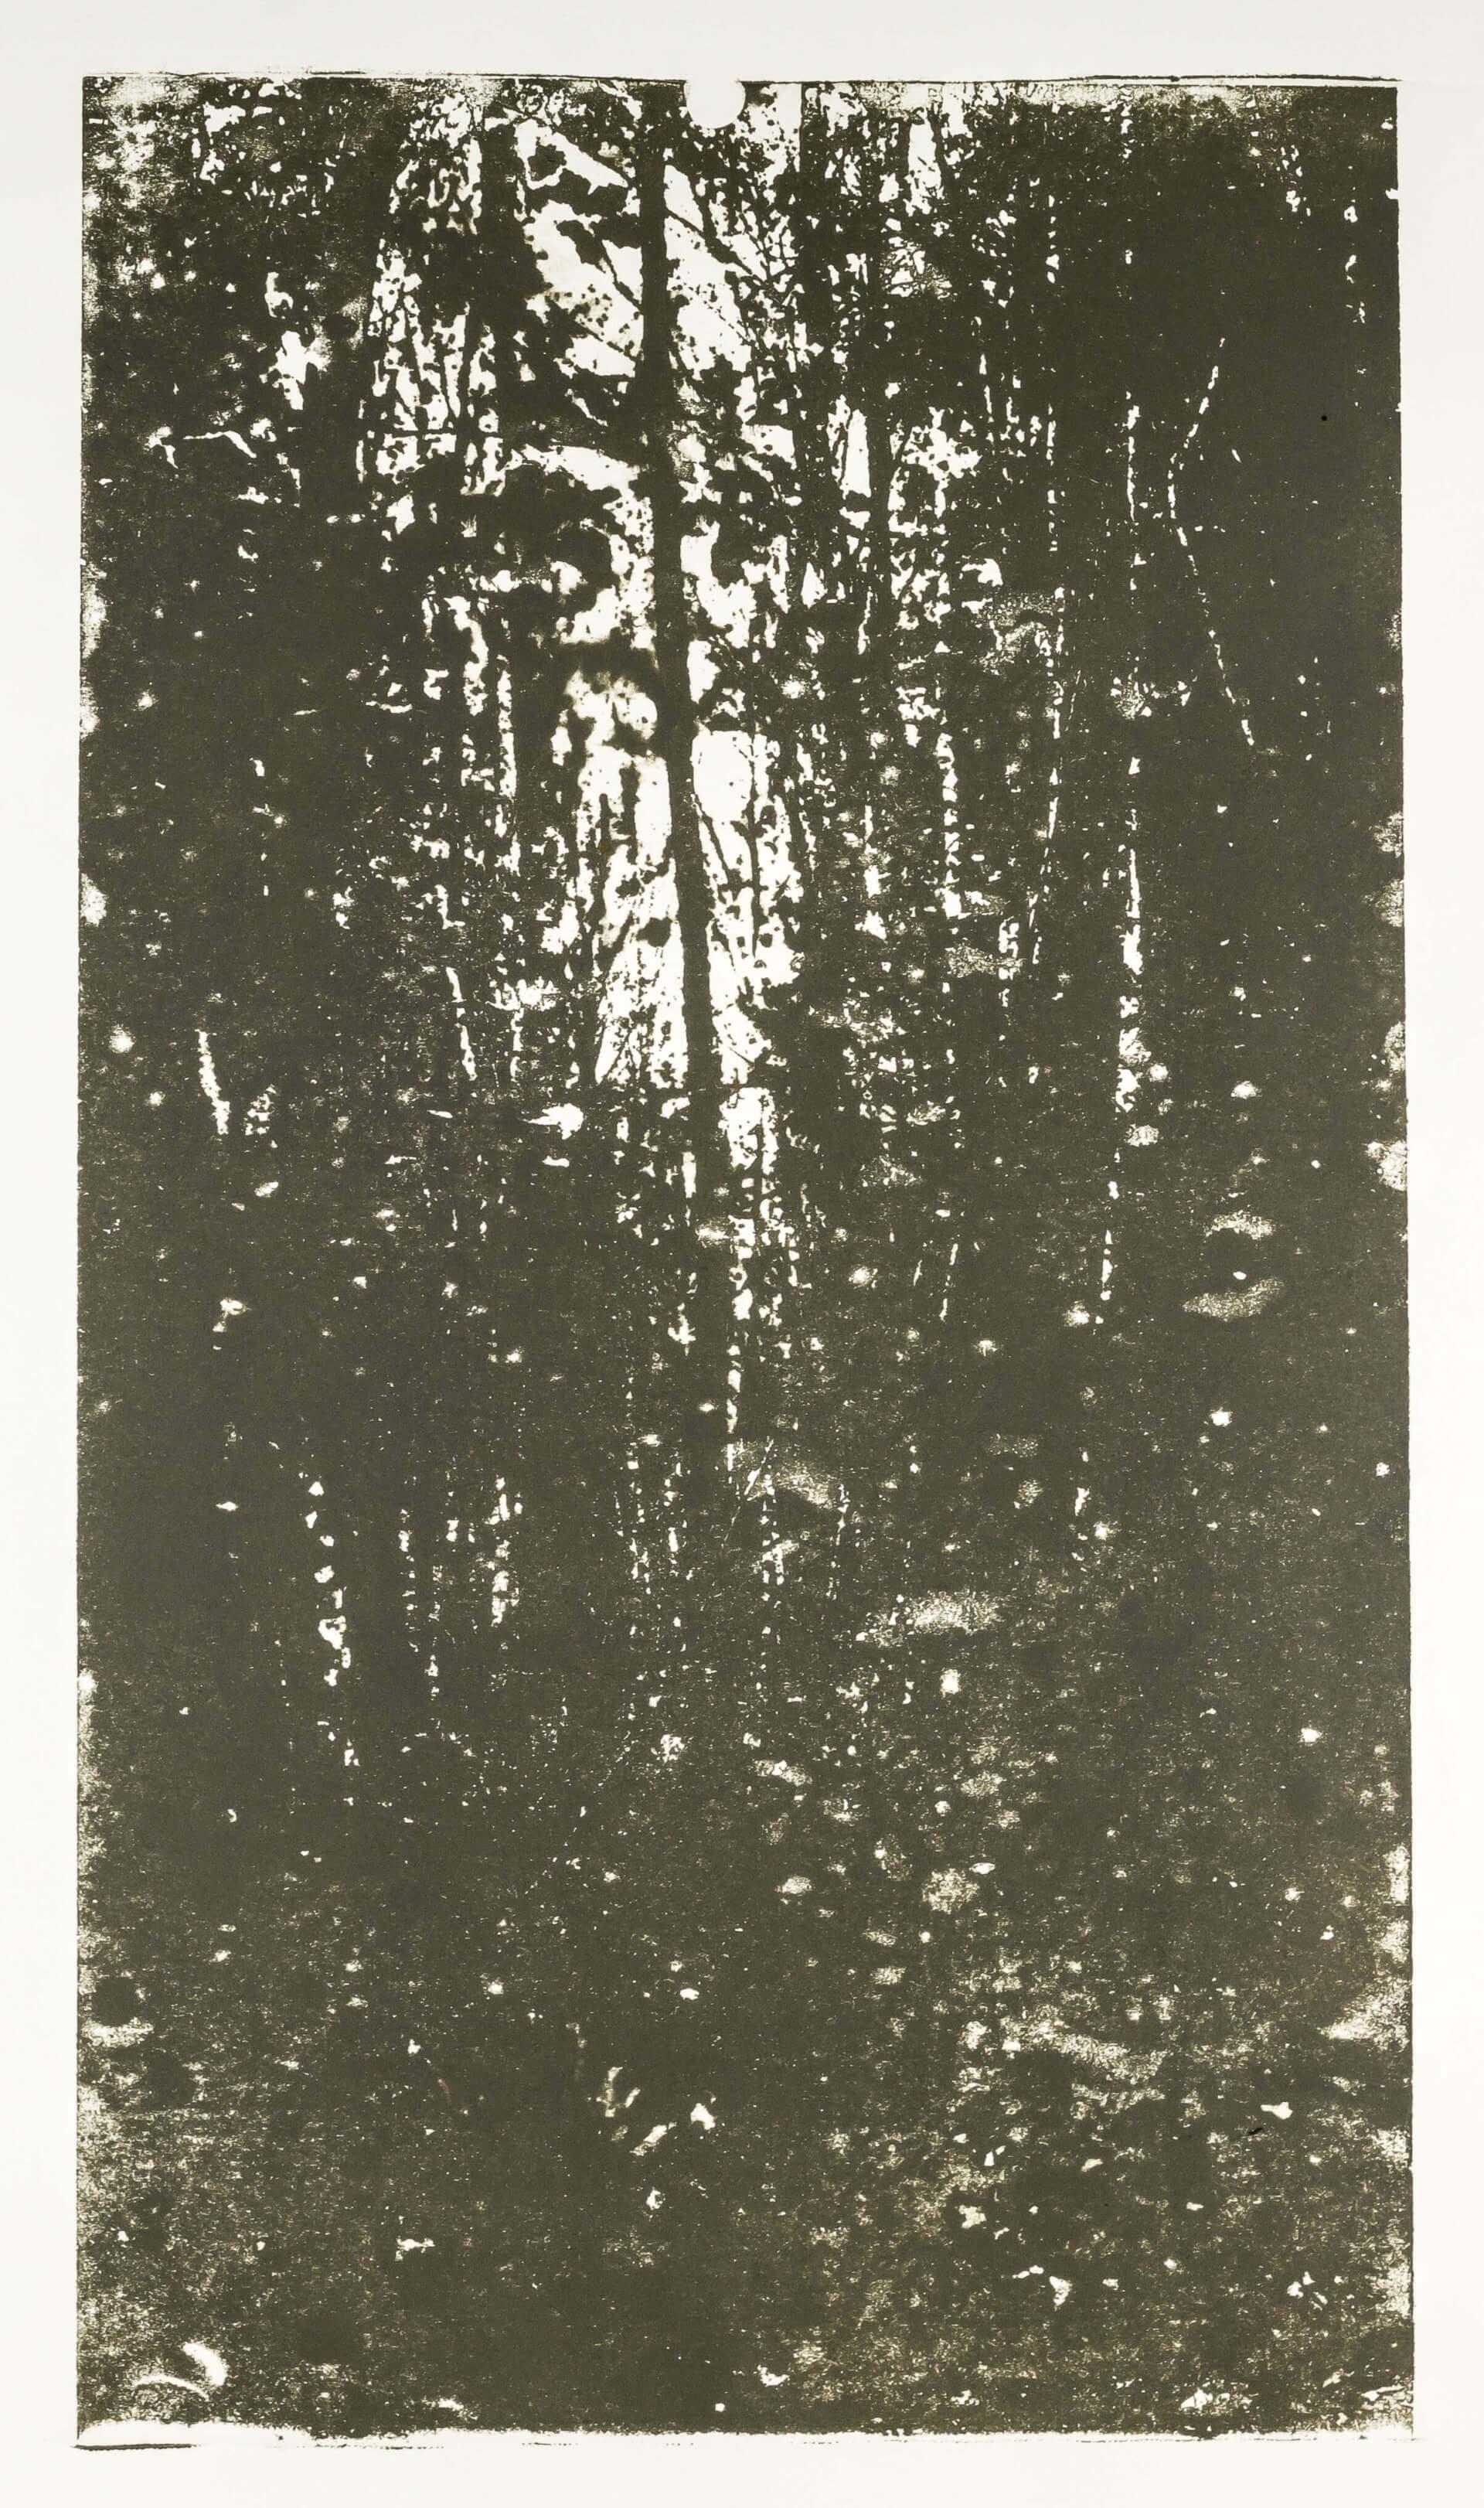 Katharina Albers, Wald XX.I-II, 2015, Farblithographie, Unikat, 60×33 cm